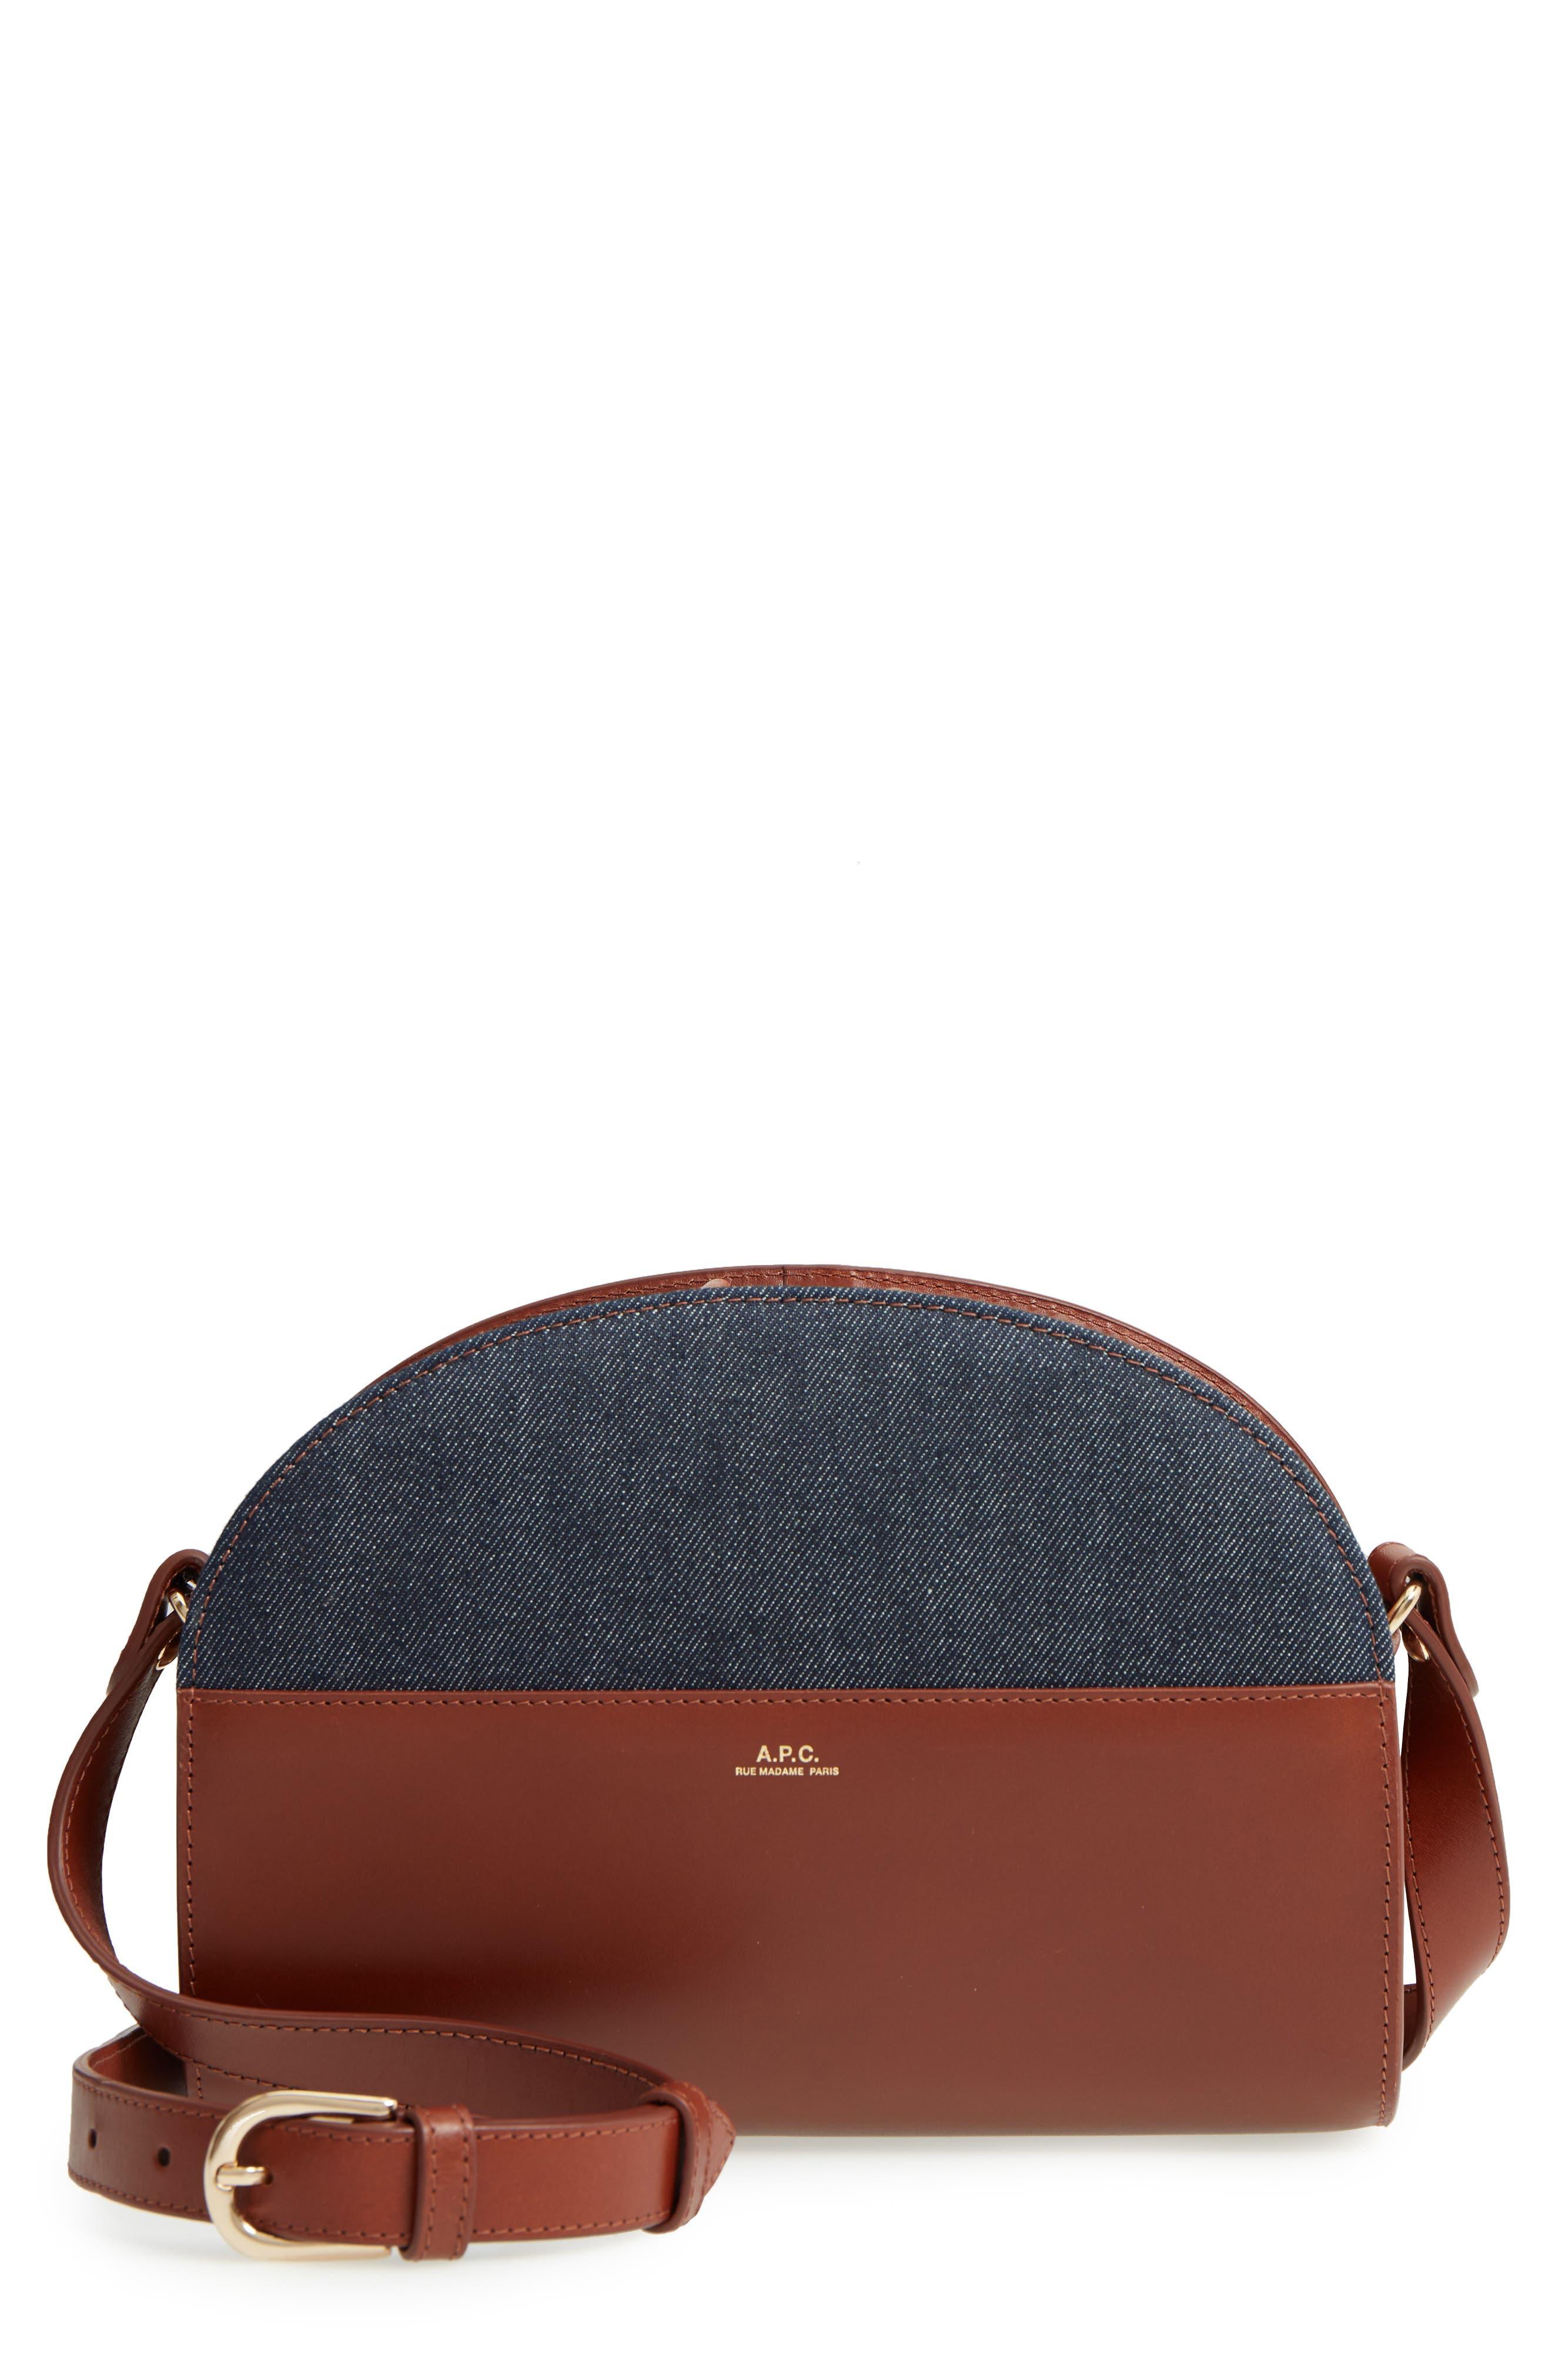 Sac Demilune Leather & Denim Crossbody Bag,                         Main,                         color, NOISETTE CAD